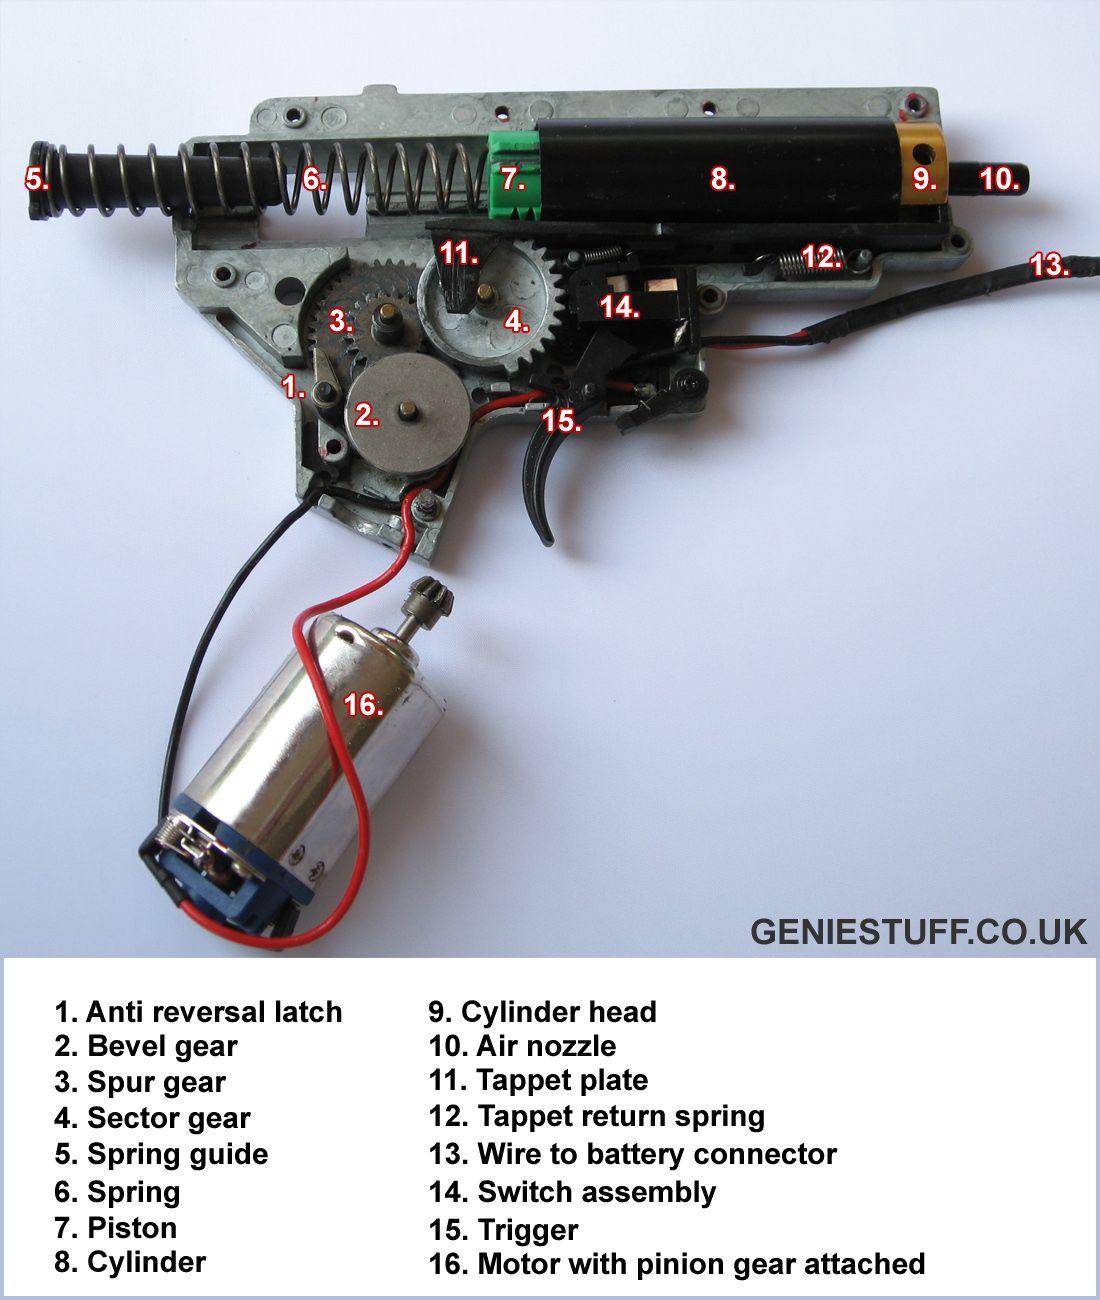 Basic Gun Diagram Francium Atom Airsoft M4 Aeg Internal Gearbox Layout With